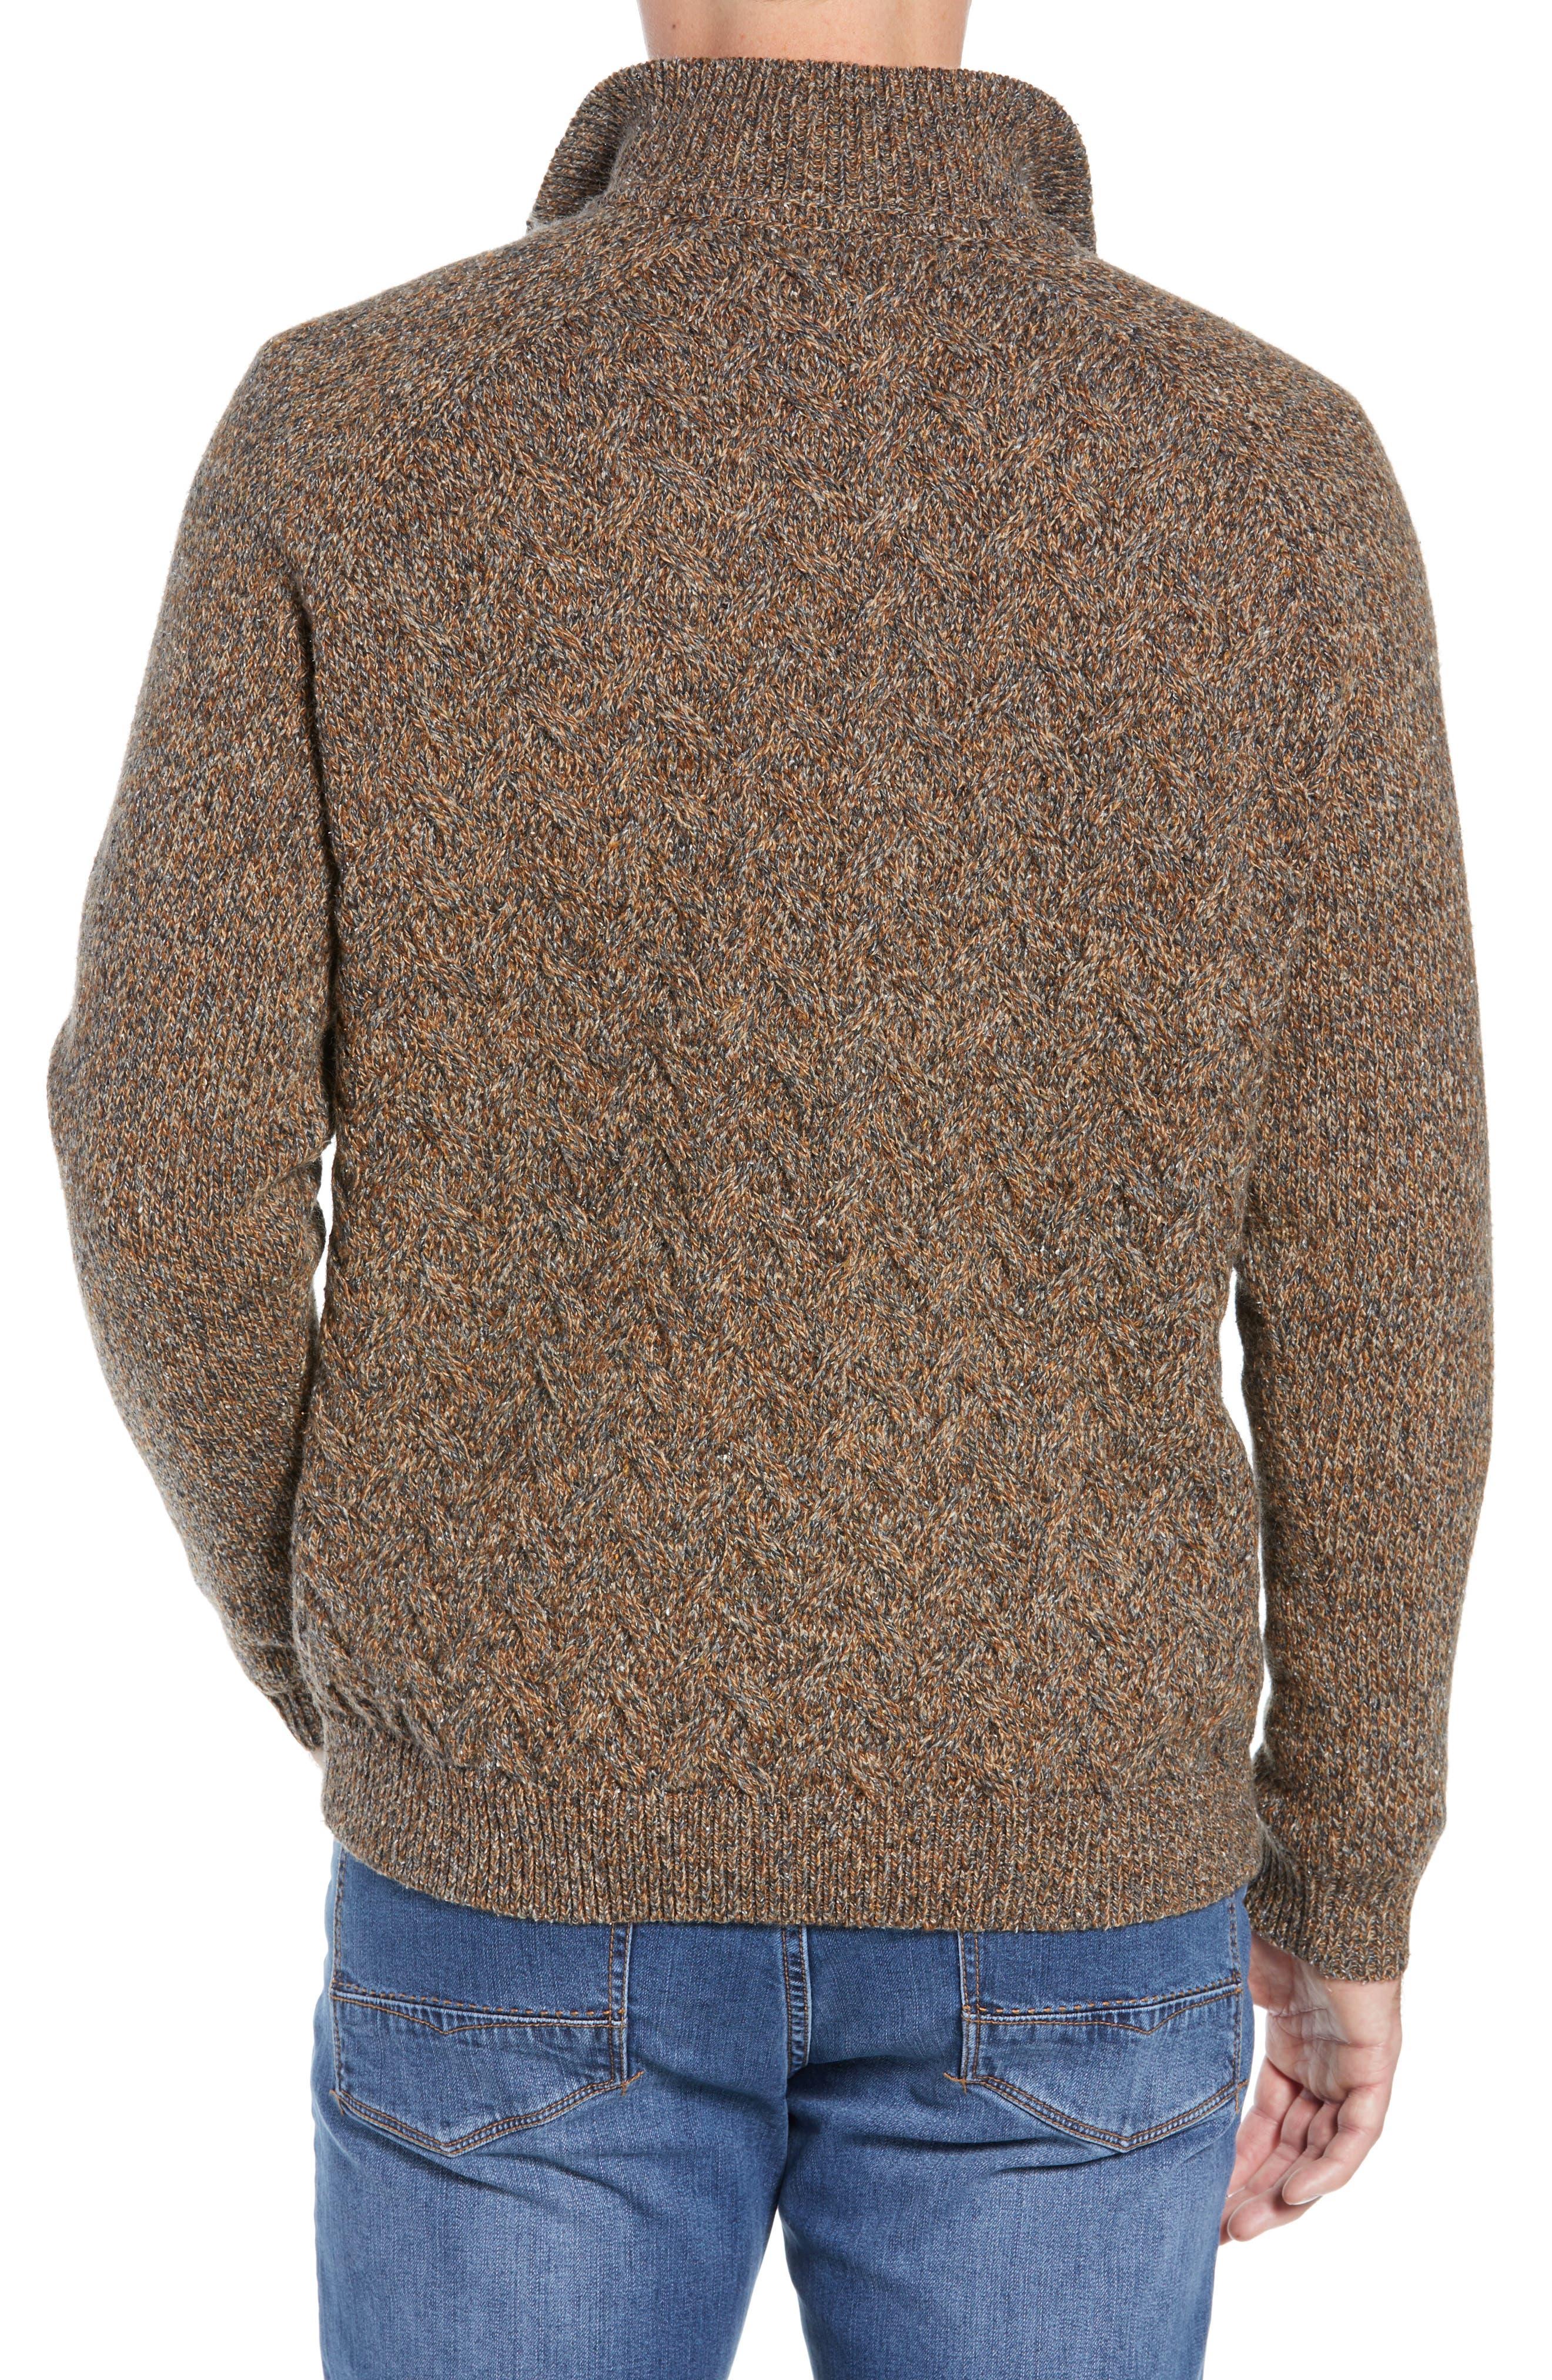 Irazu Half Zip Sweater,                             Alternate thumbnail 2, color,                             201